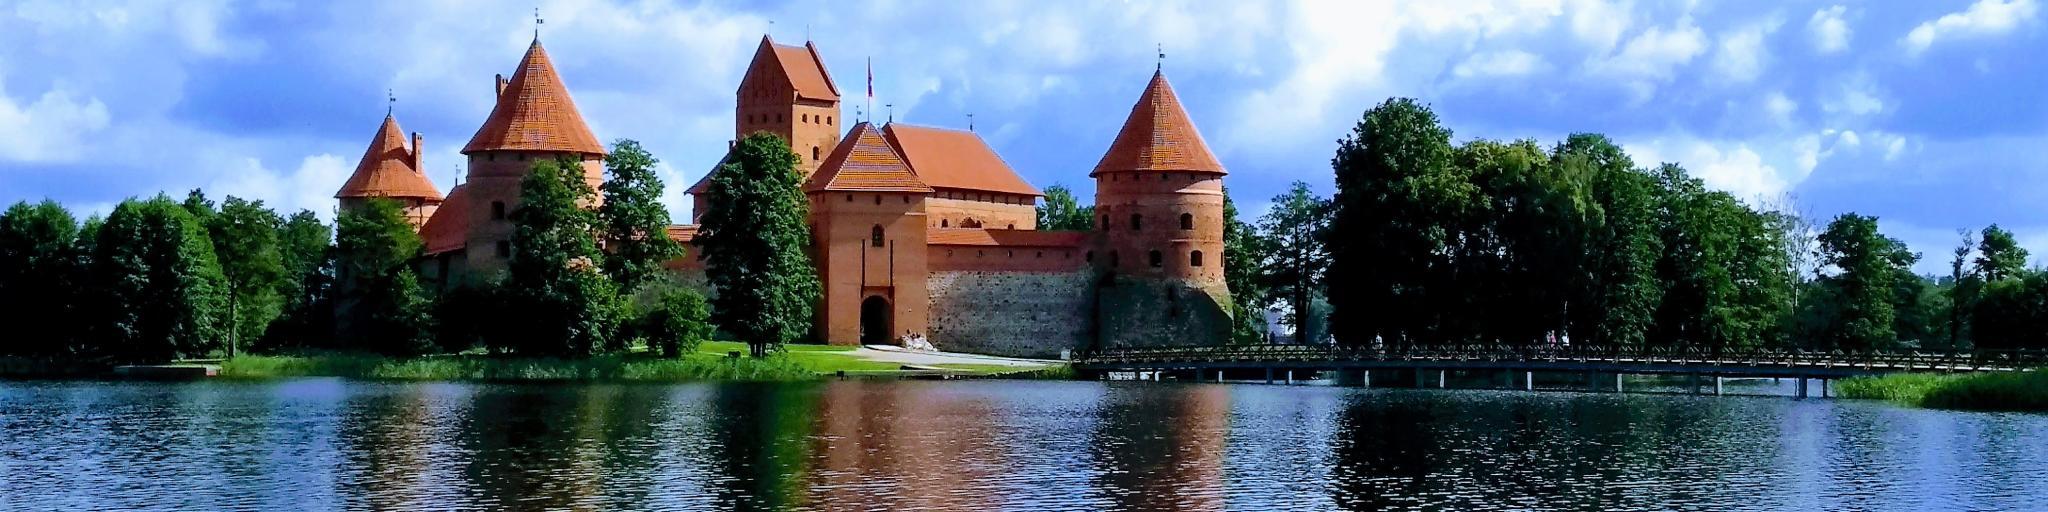 Trakai Castle and its reflection on the beautiful Lake Galvė